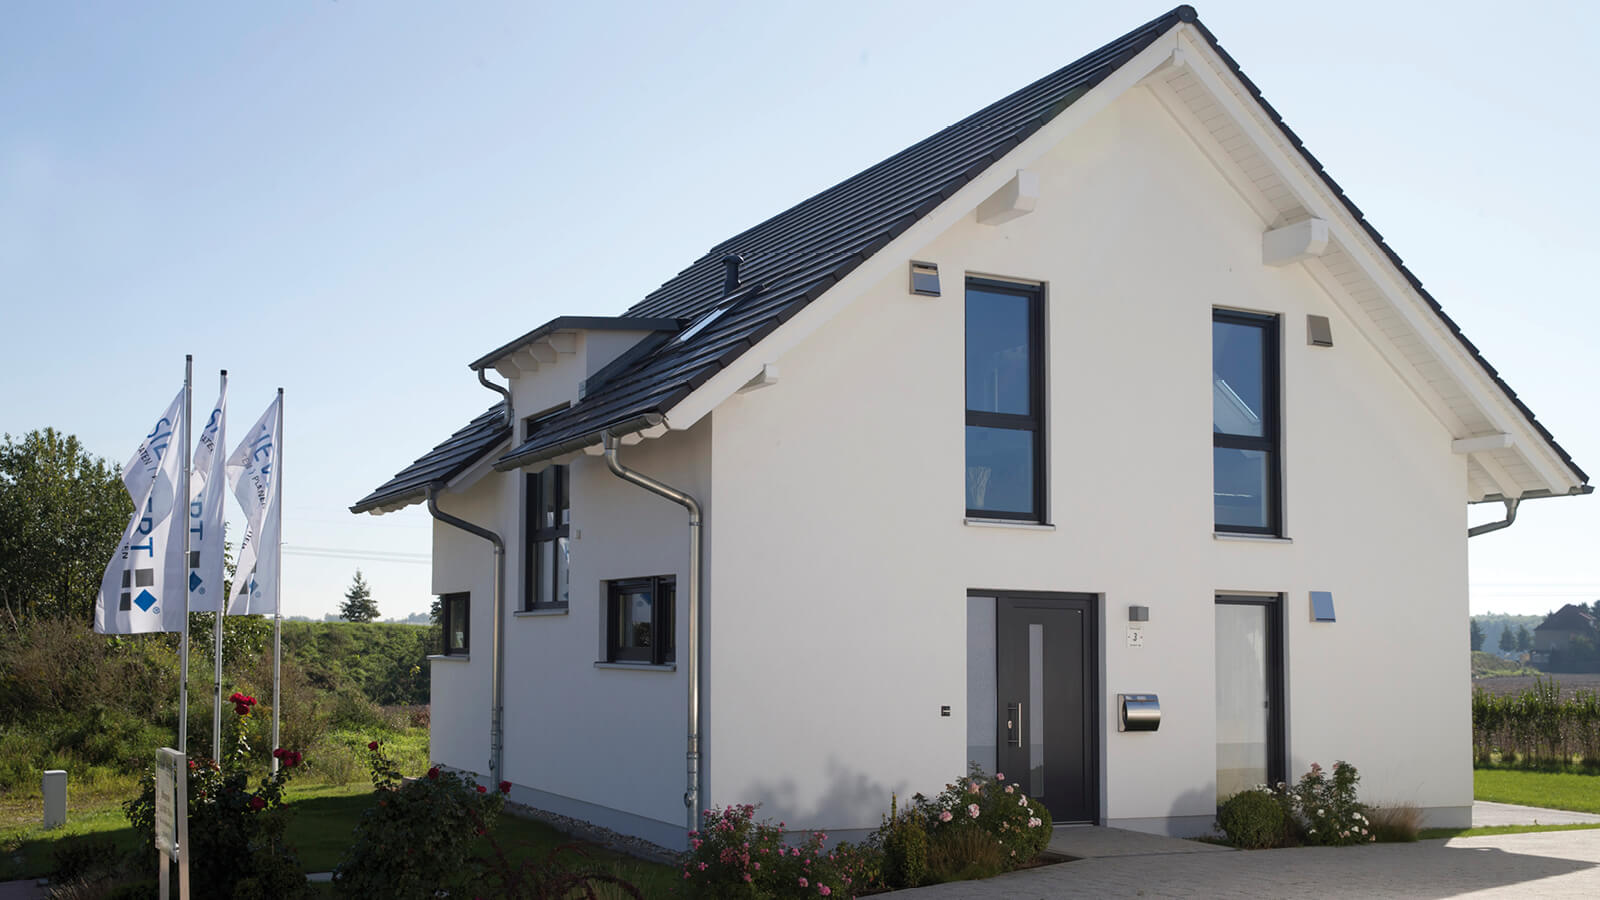 Musterhaus r ckmarsdorf siewert hausbau for Haus bauen leipzig